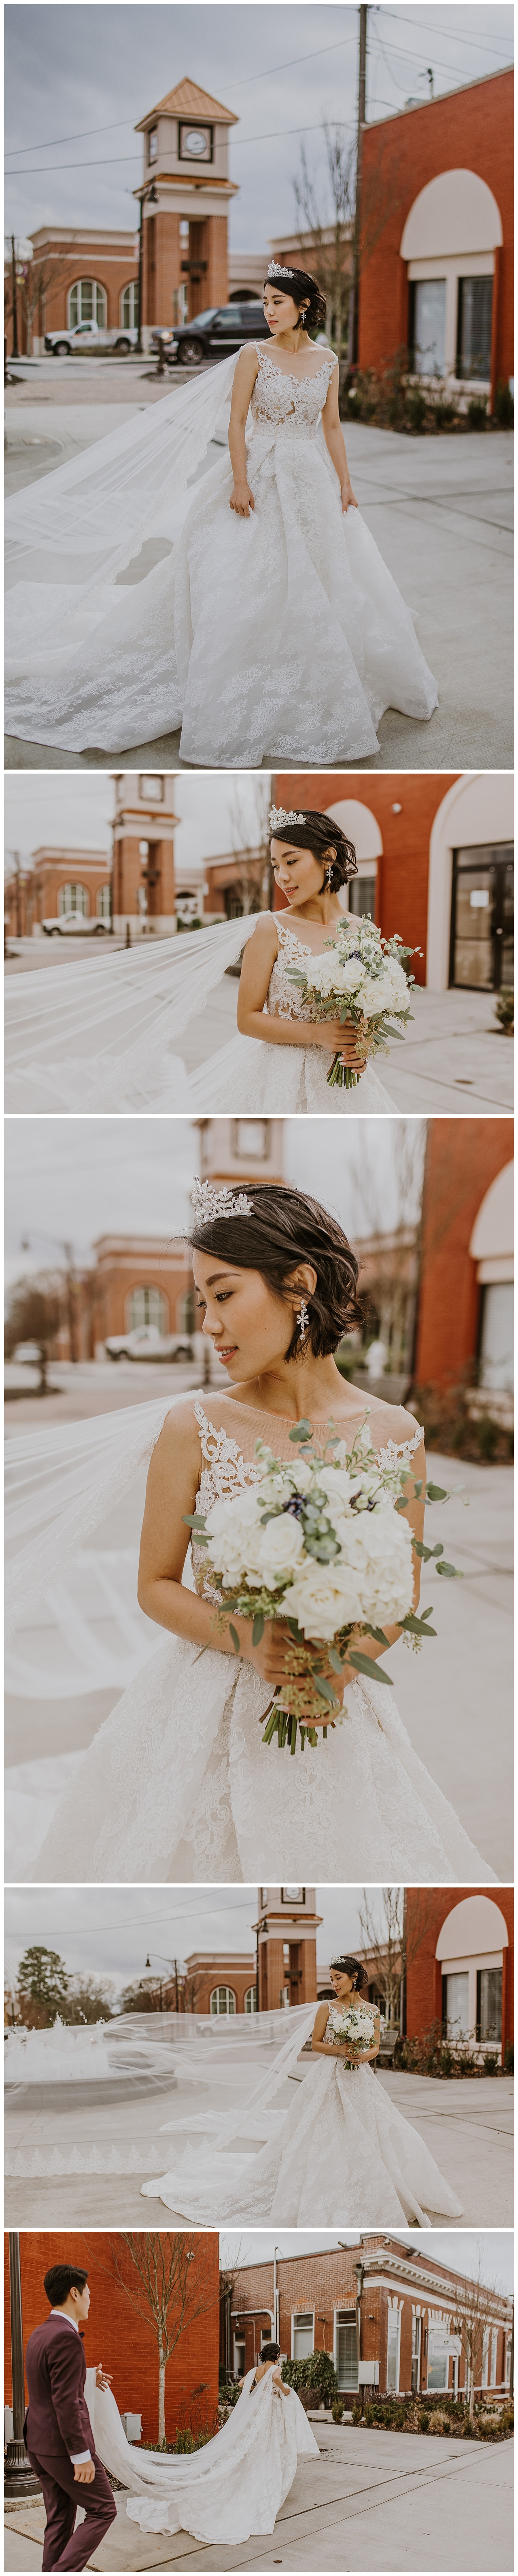 DOUGLASVILLE_GEORGIA_WEDDING_PHOTOGRAPHER_ELOPEMENT_ATLANTA_NATURAL_LIGHT_MOODY_SUNNY_0008.jpg